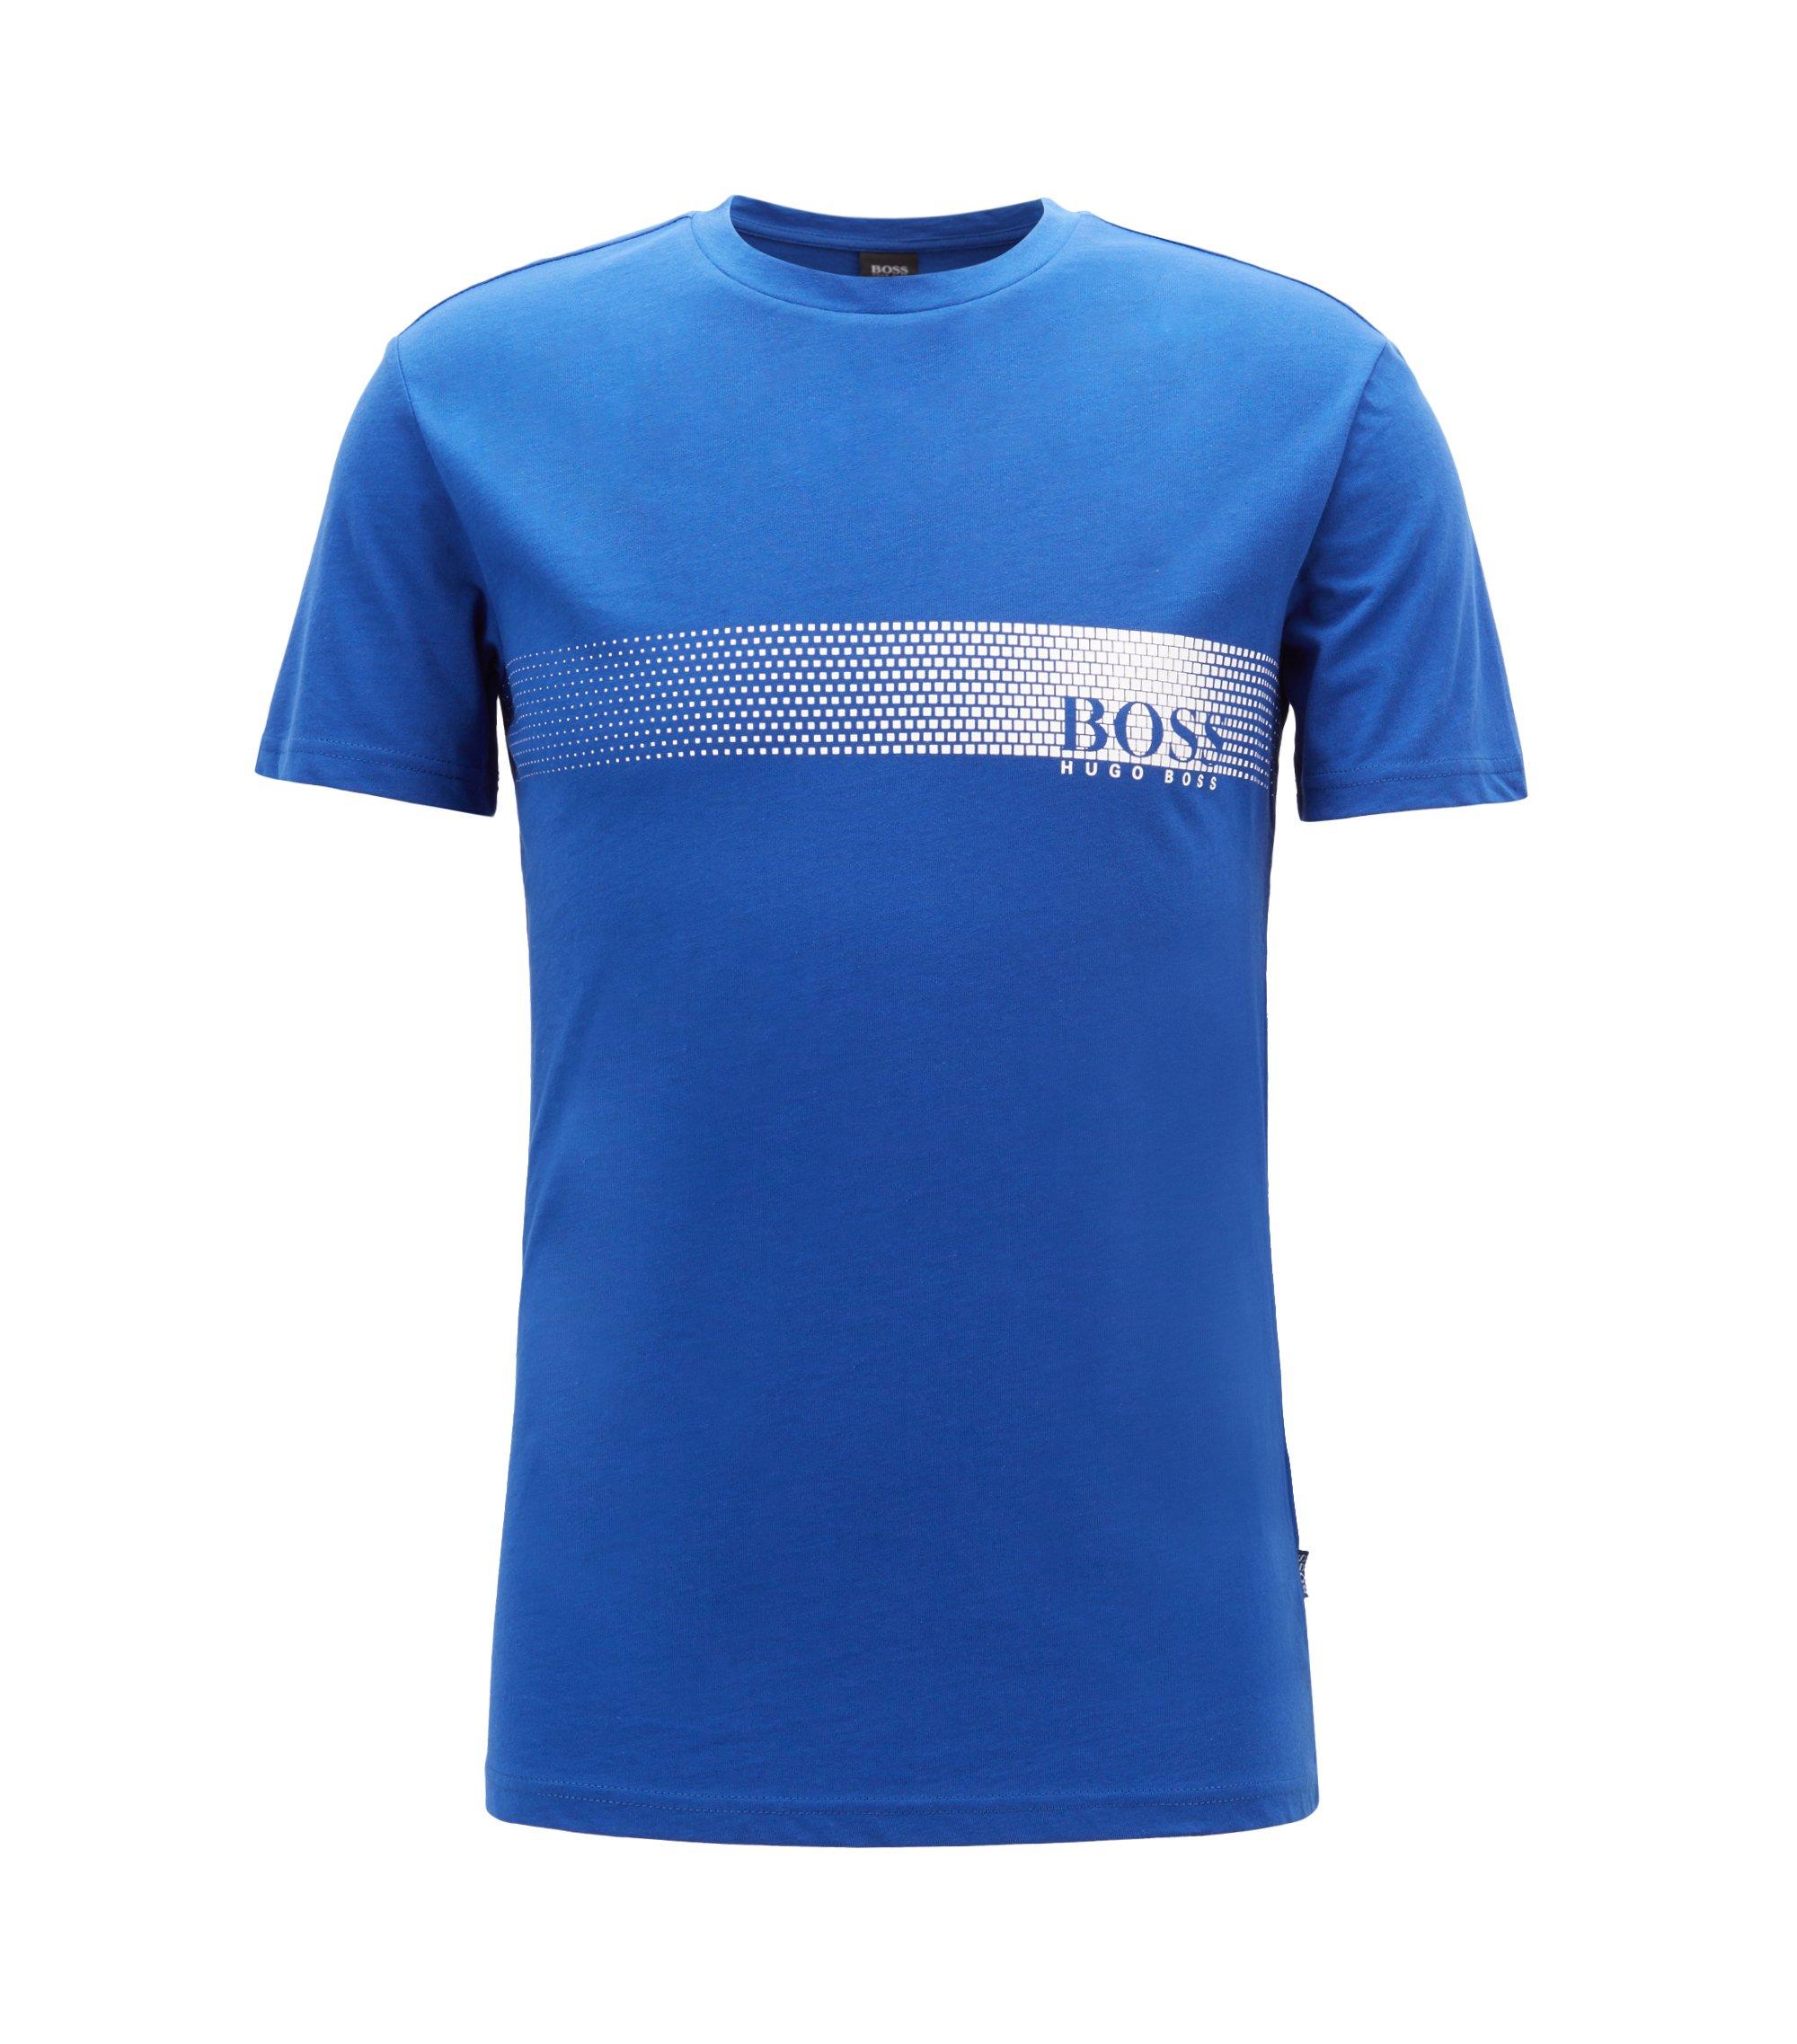 Camiseta con logo en algodón con protección solar, Azul